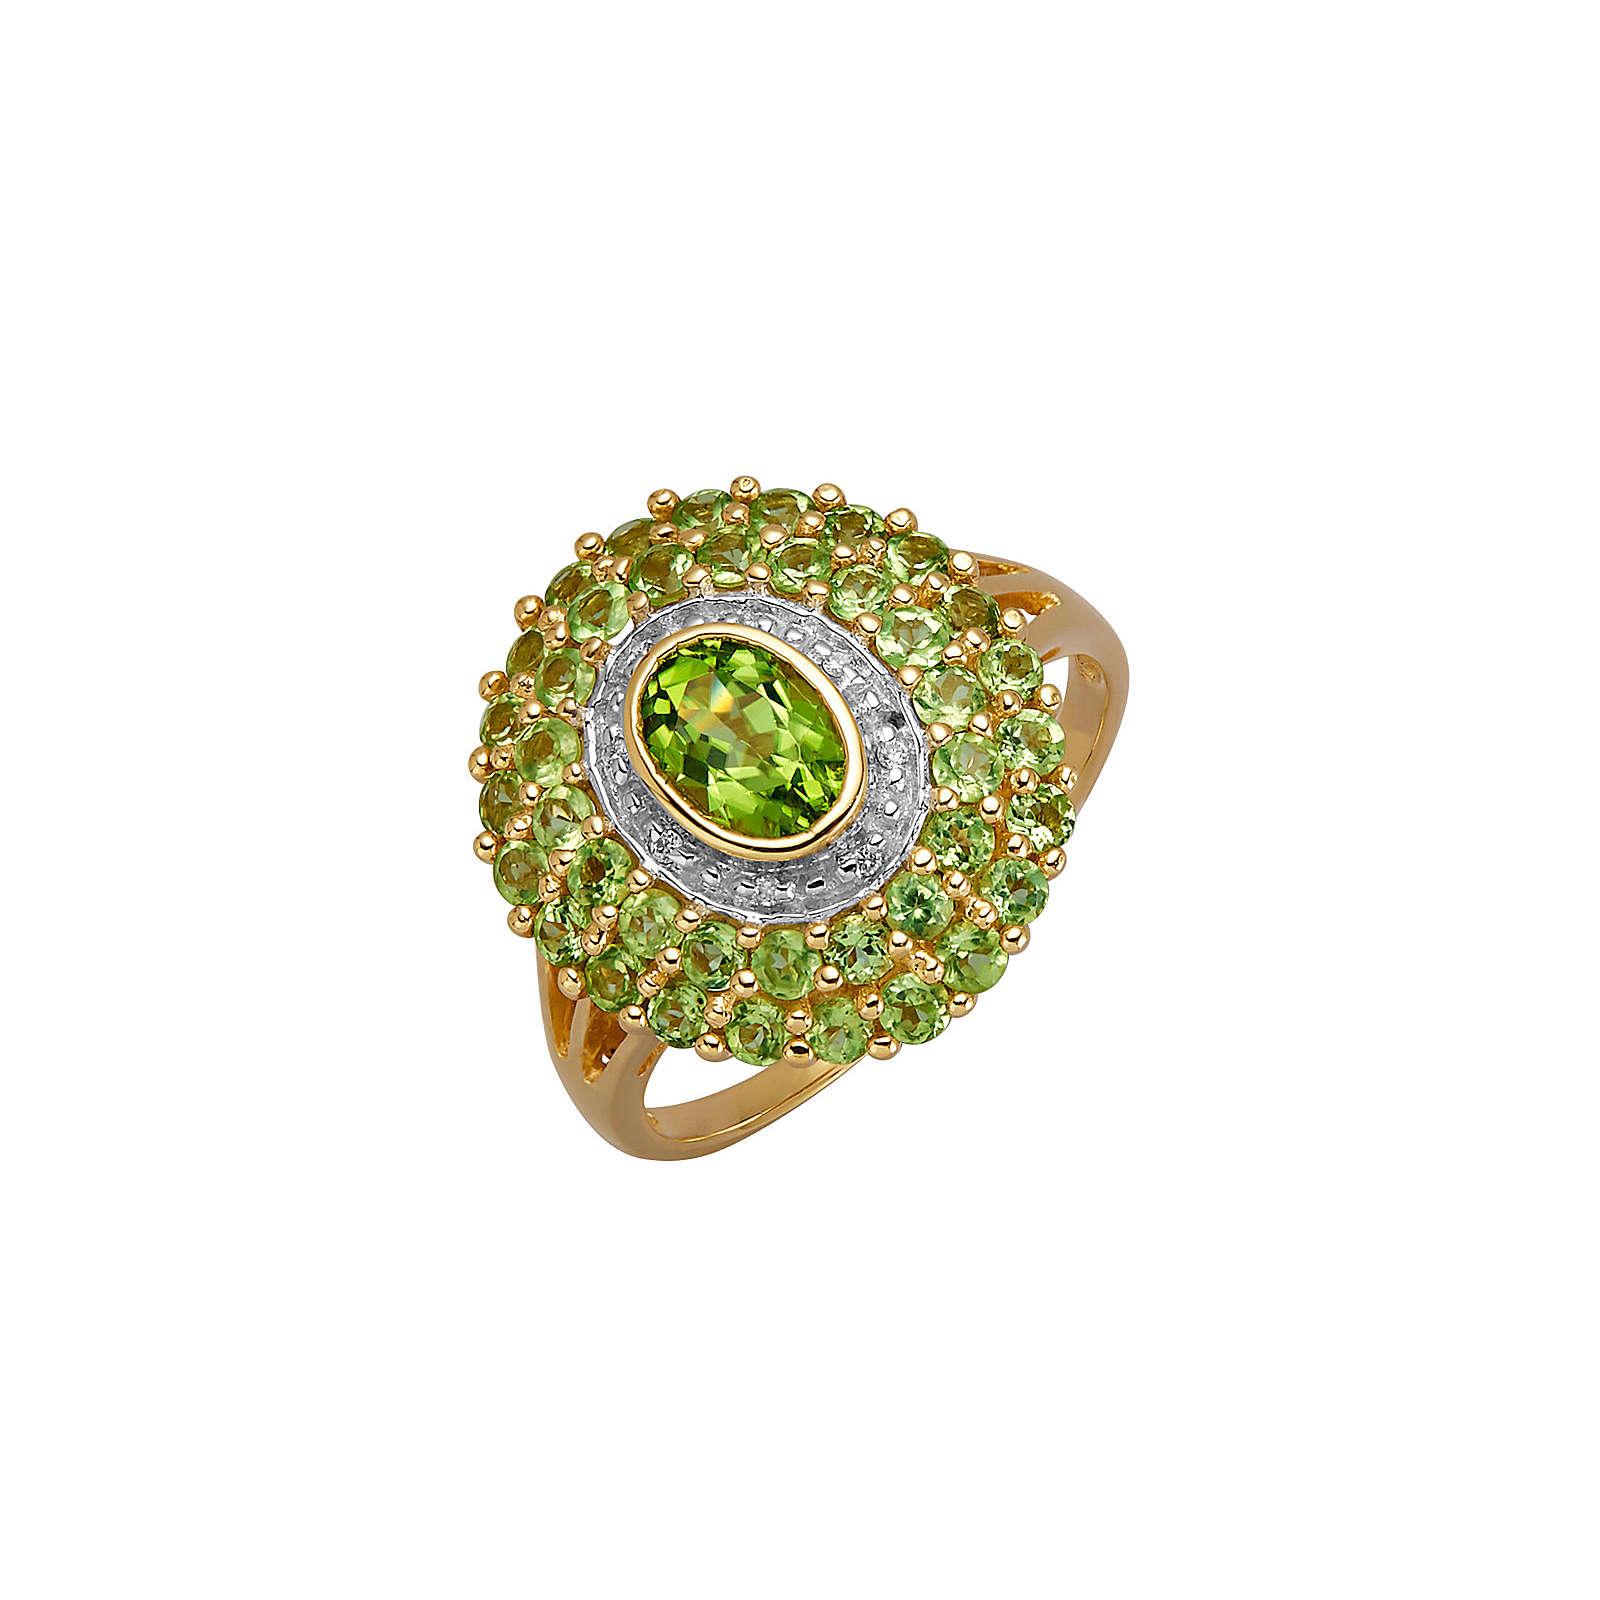 Diemer Farbstein Damenring mit Peridot grün Damen Gr. 60